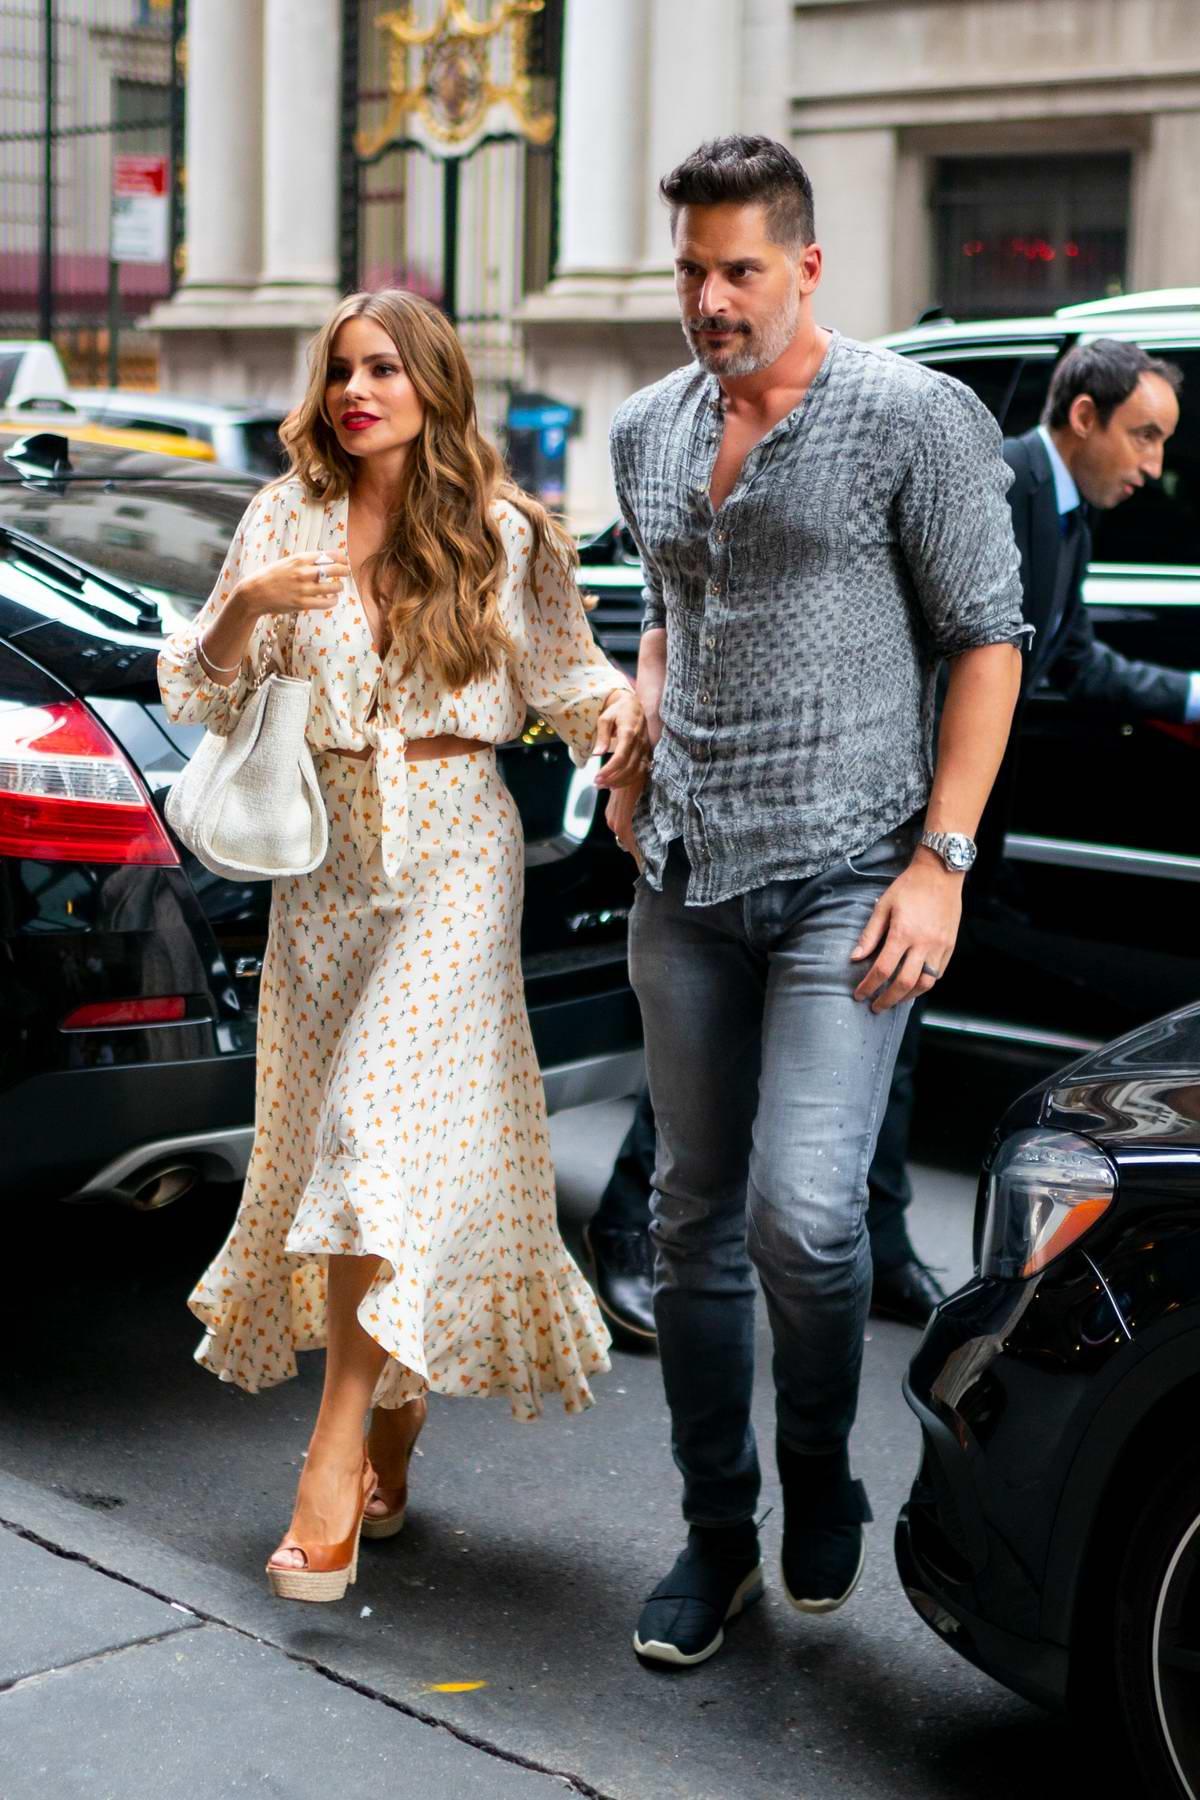 Sofia Vergara and Joe Manganiello enjoy a dinner date at Avra in New York City